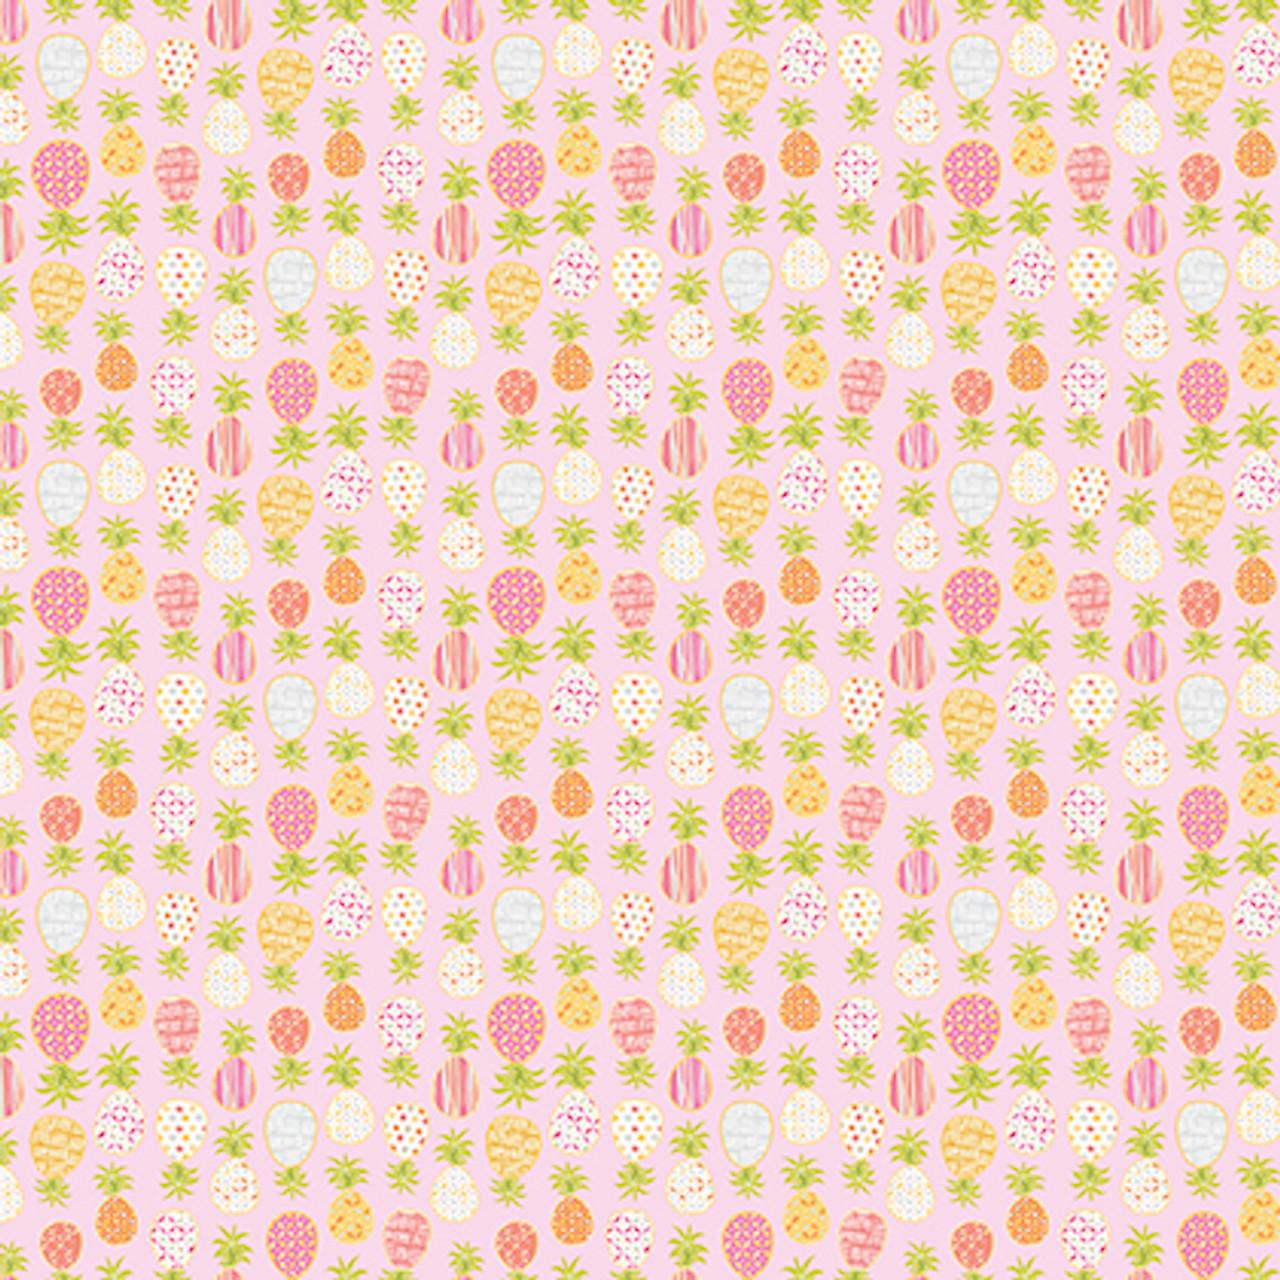 Dena Designs Haute Zahara PWDF273 Pineapple Mustard Cotton Fabric By Yard